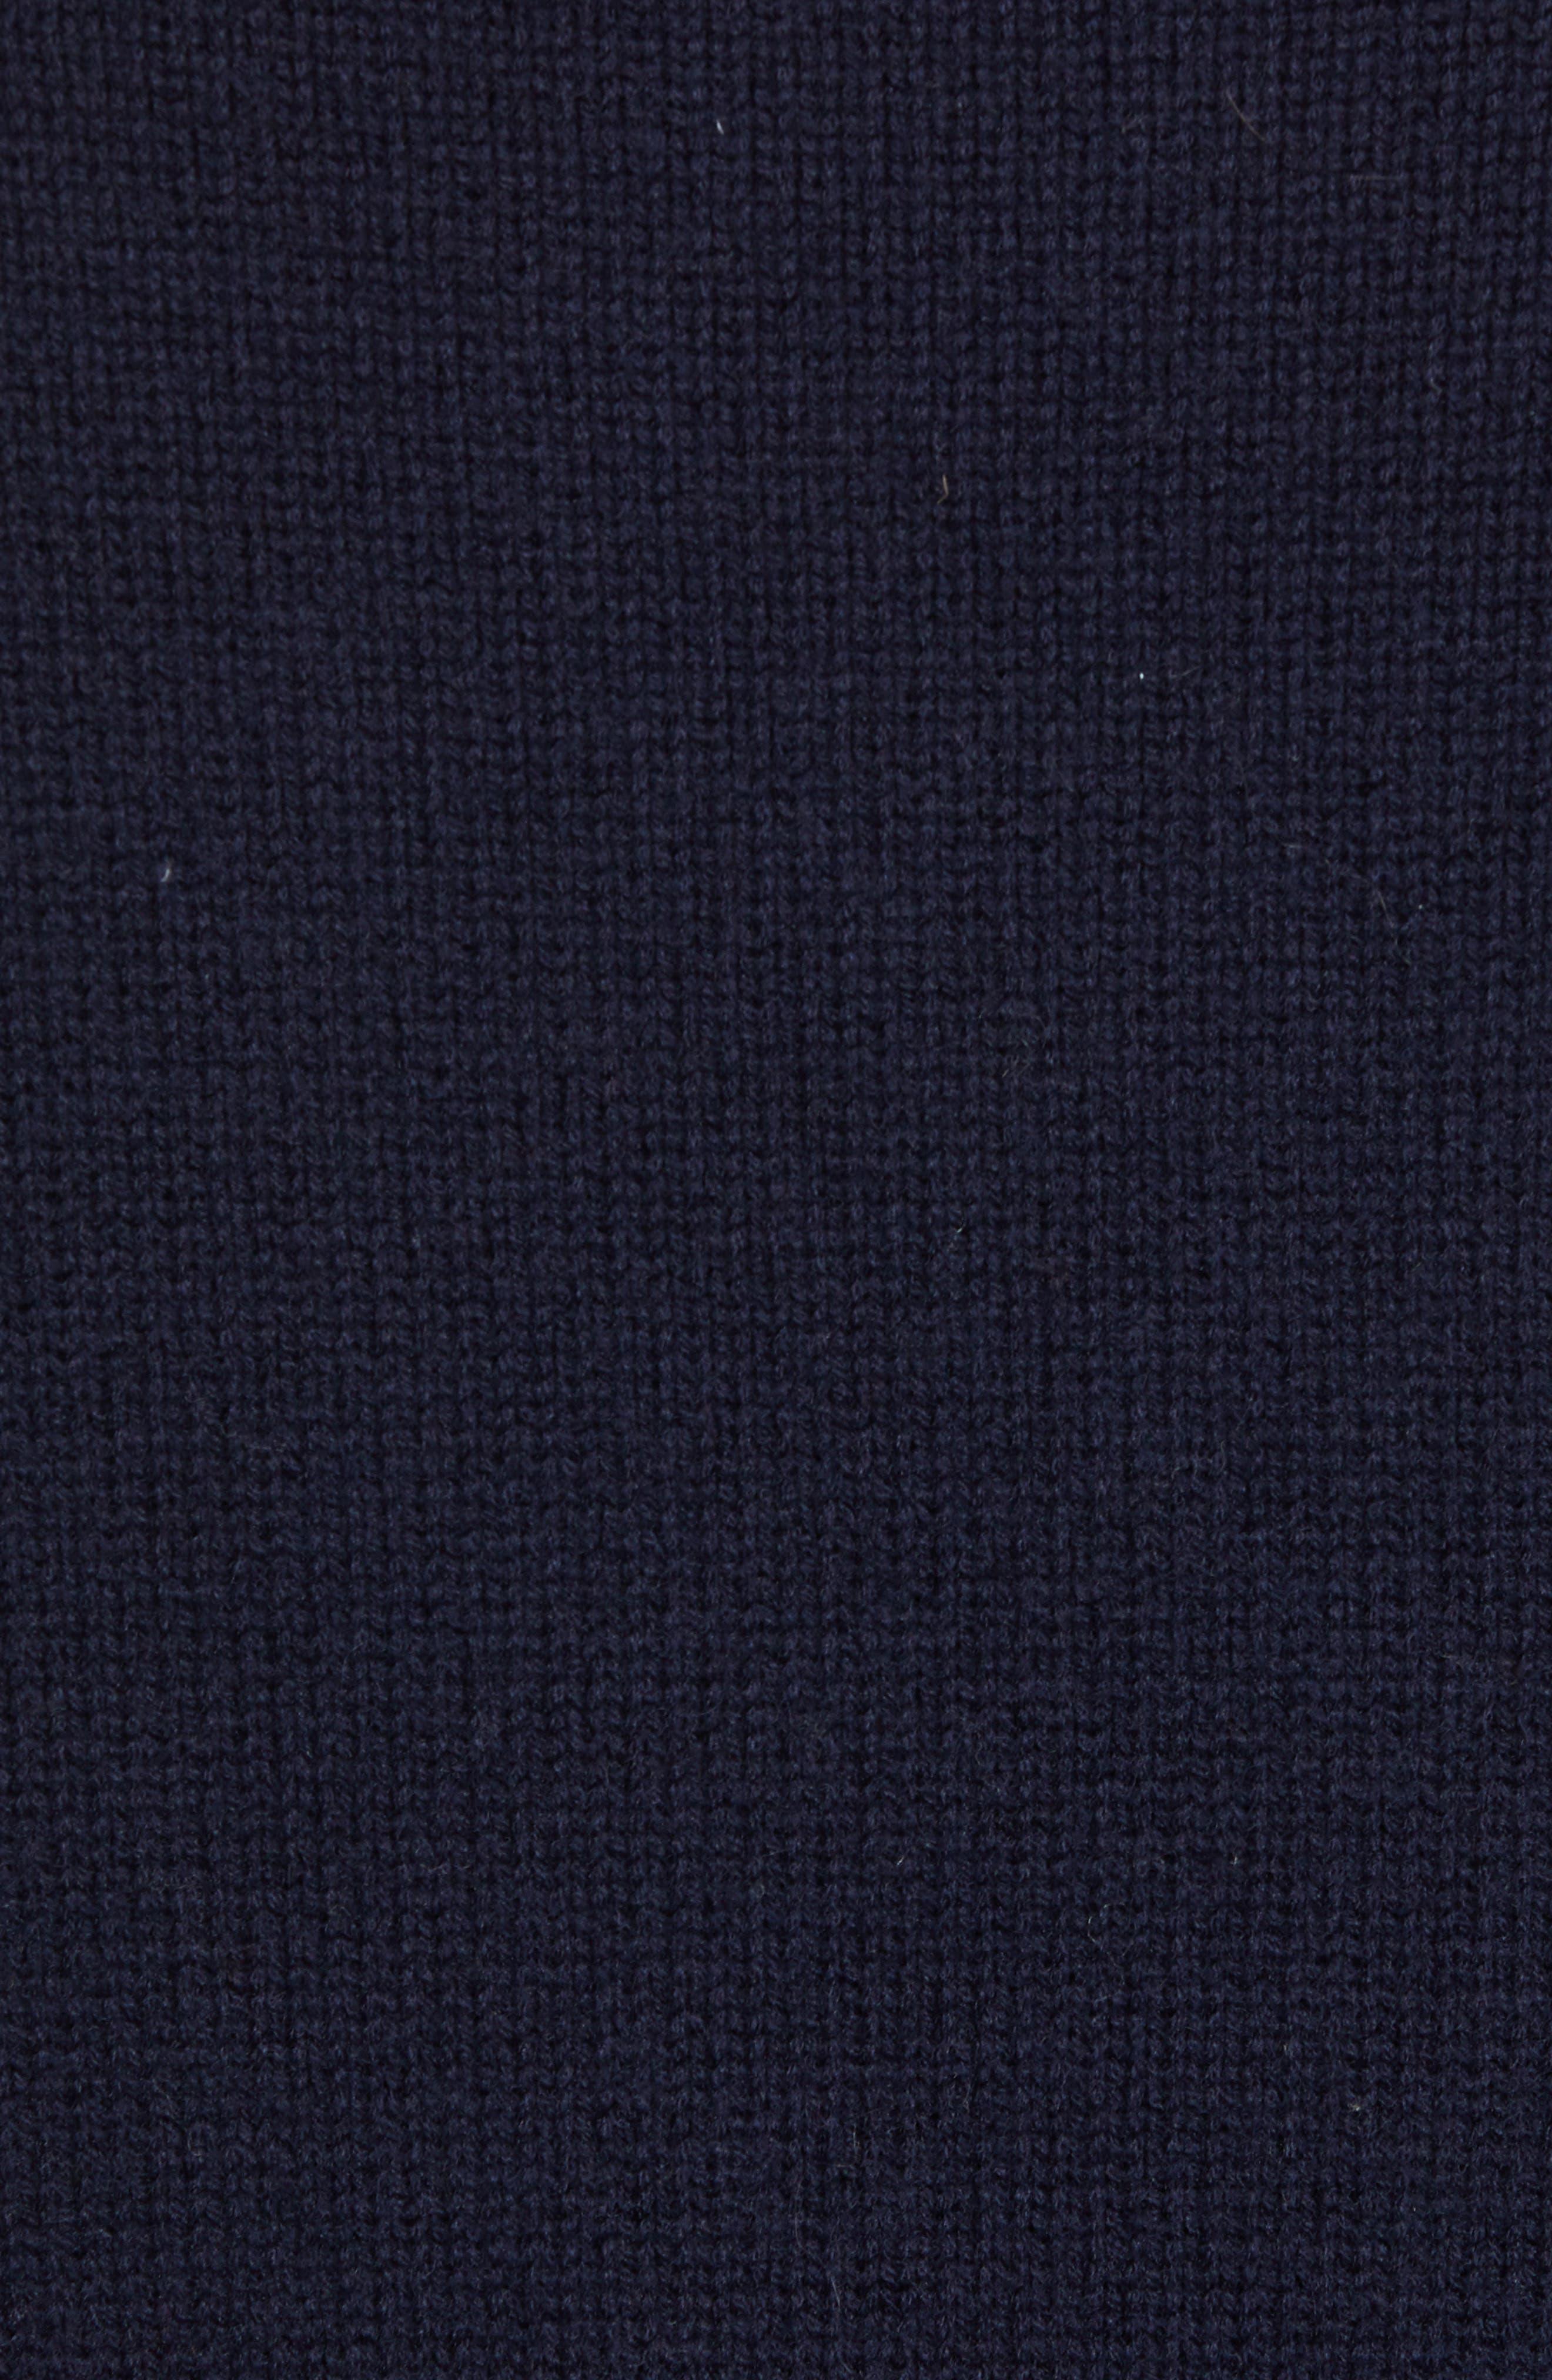 Fisherman Wool Blend Crewneck Sweater,                             Alternate thumbnail 5, color,                             UTILITY BLUE